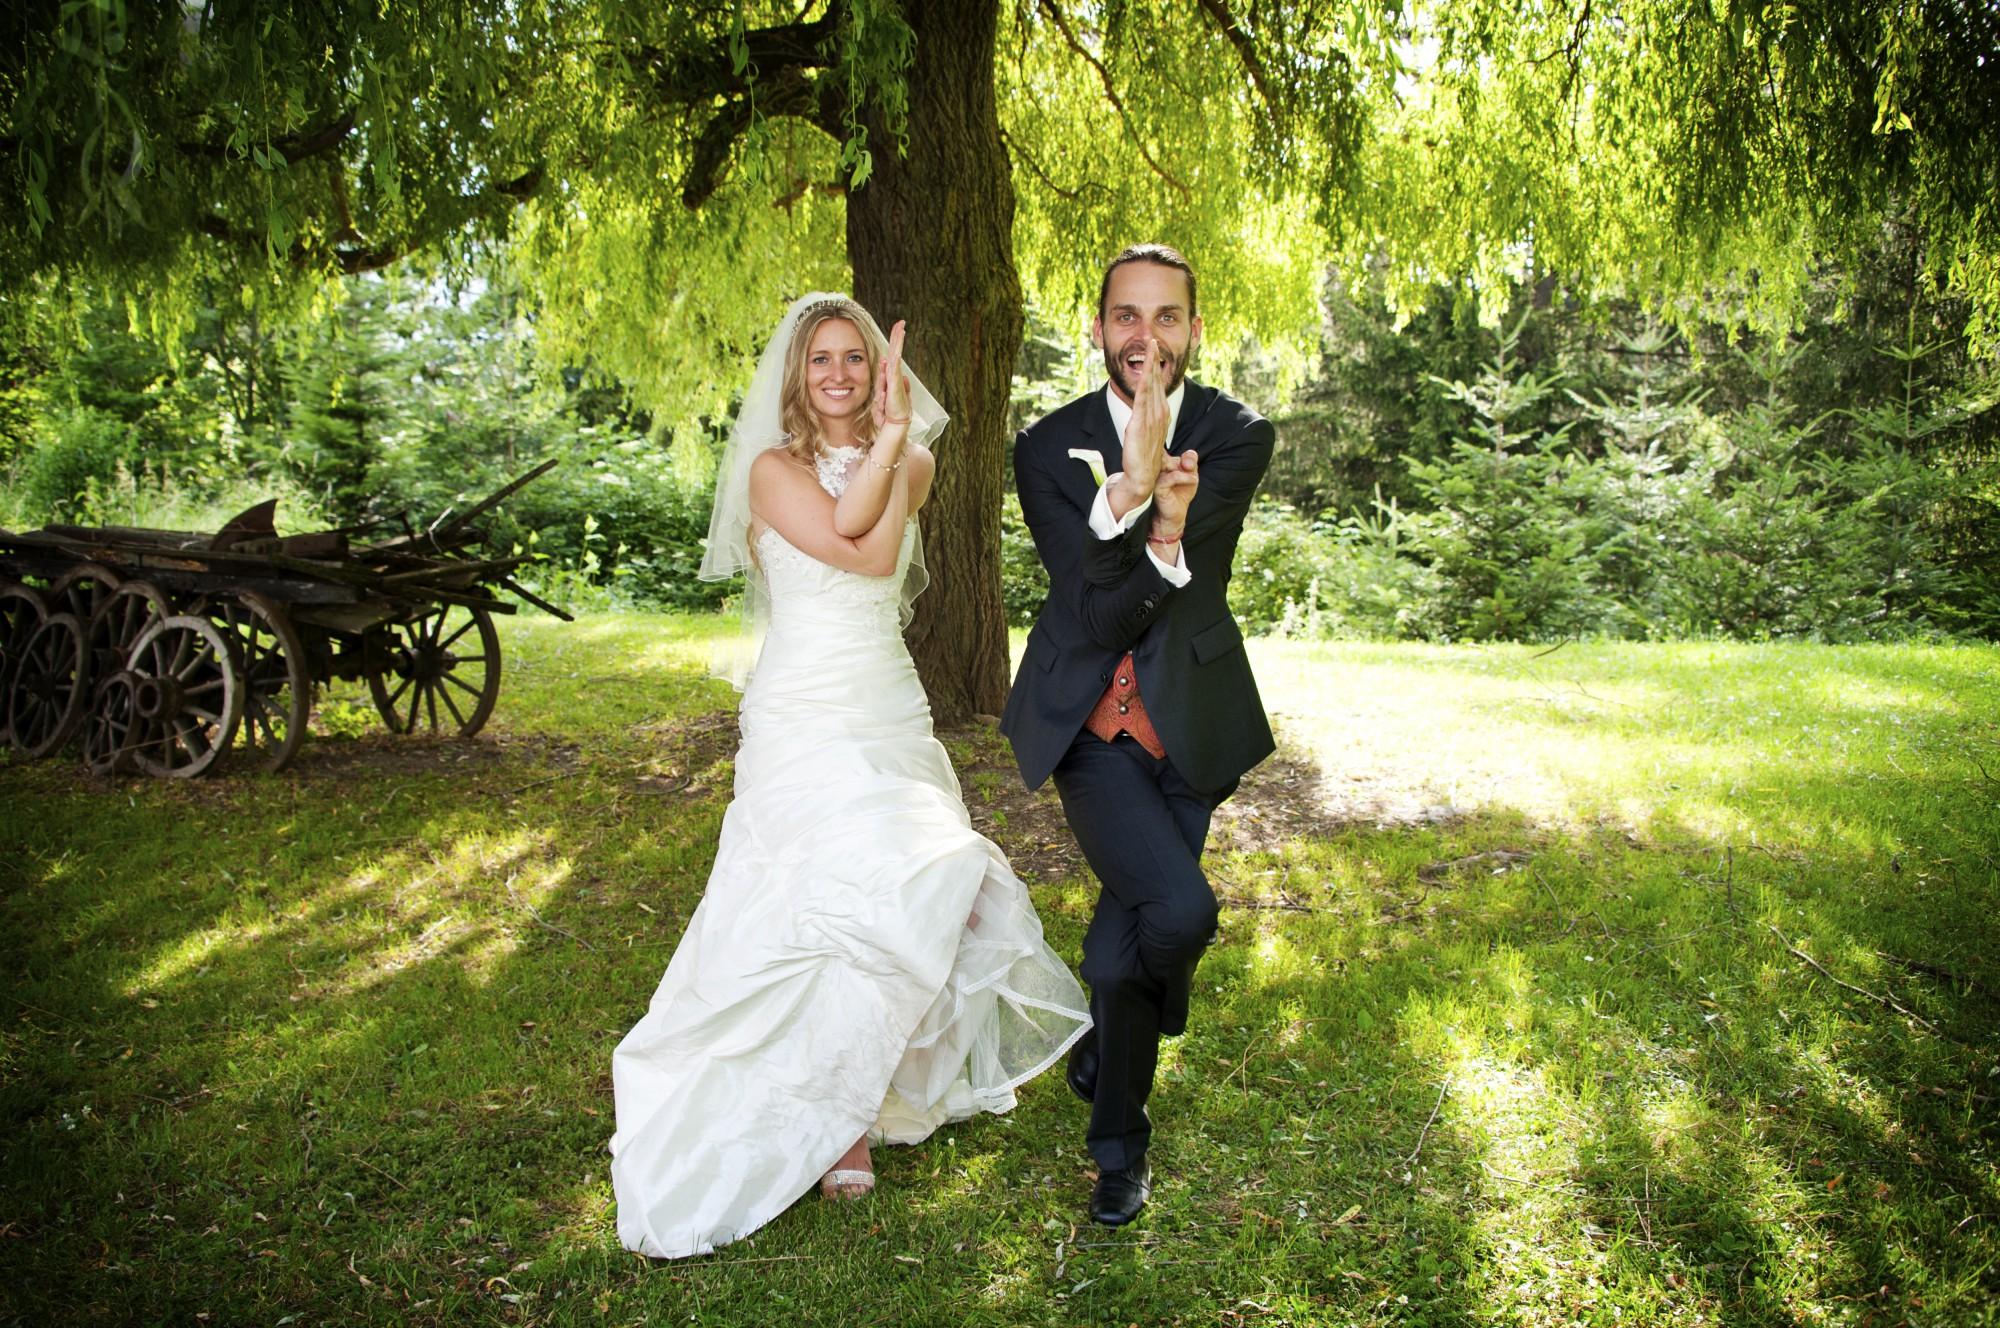 wedding_yoga-e1447861336978.jpg